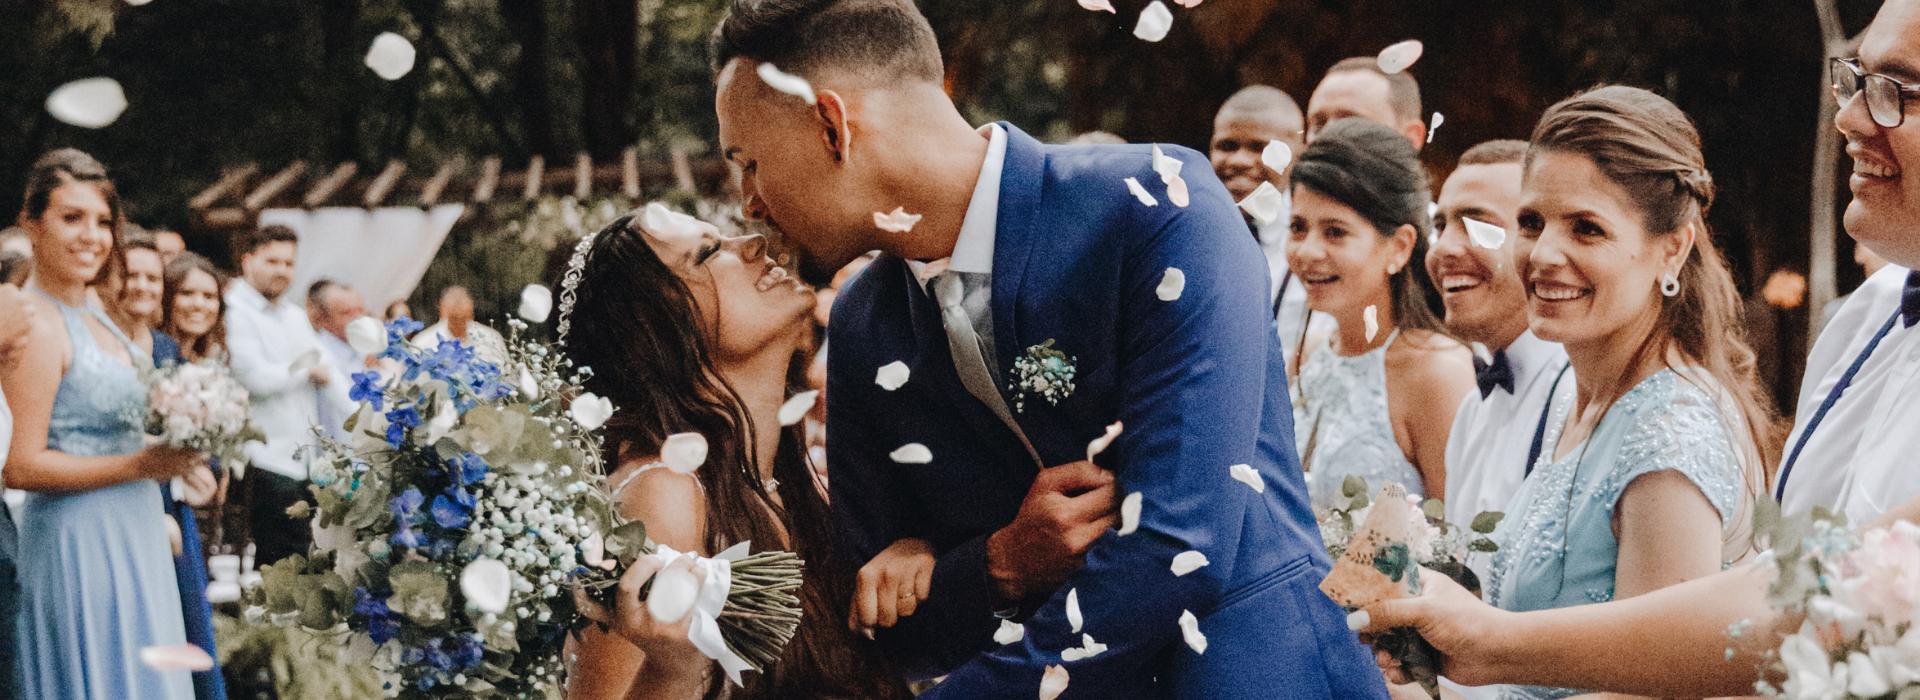 Wedding celebration with falling flower petals